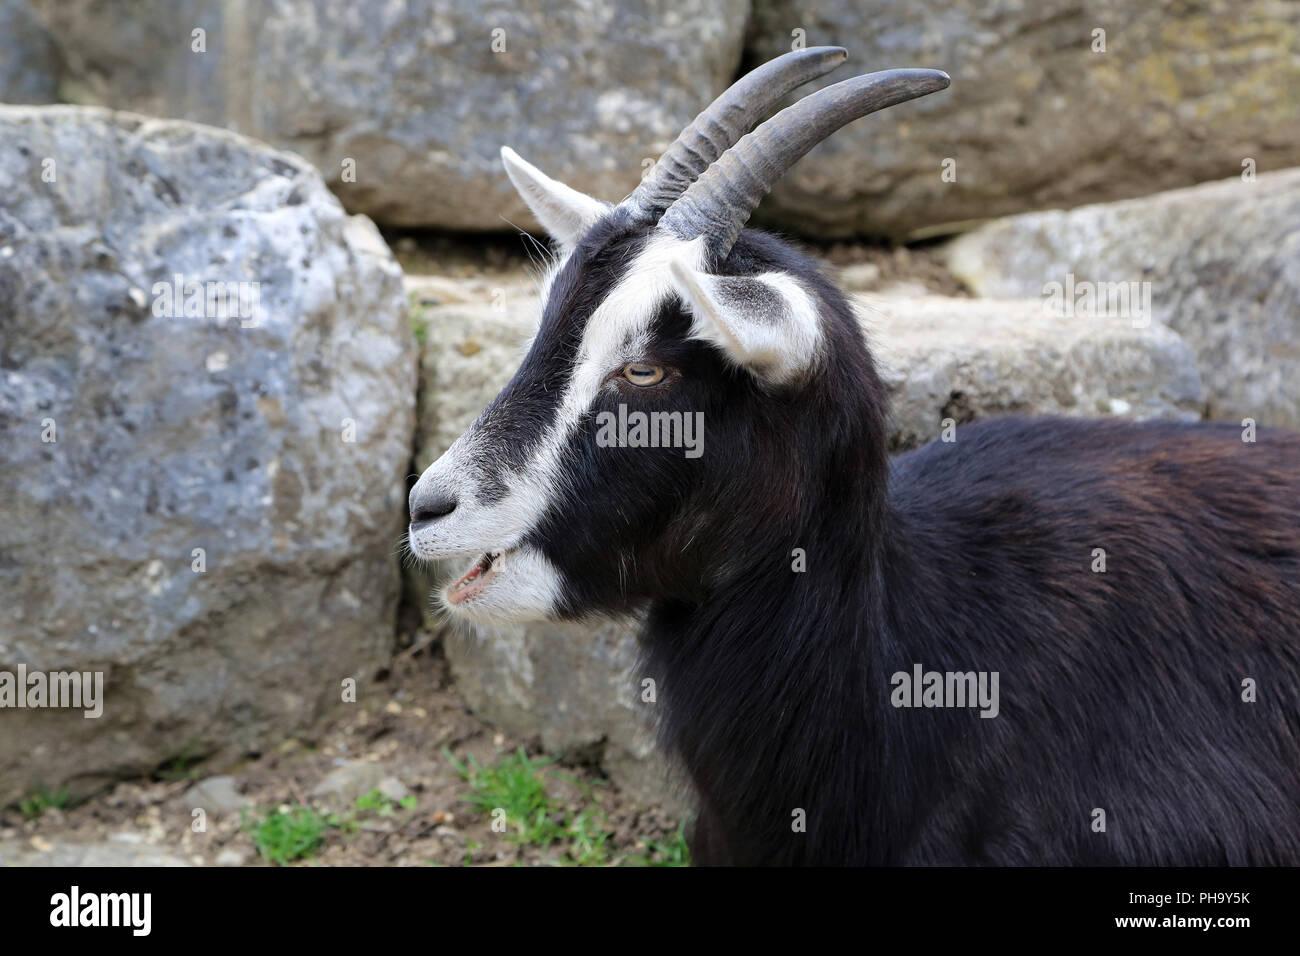 Swiss black and white goat - Stock Image